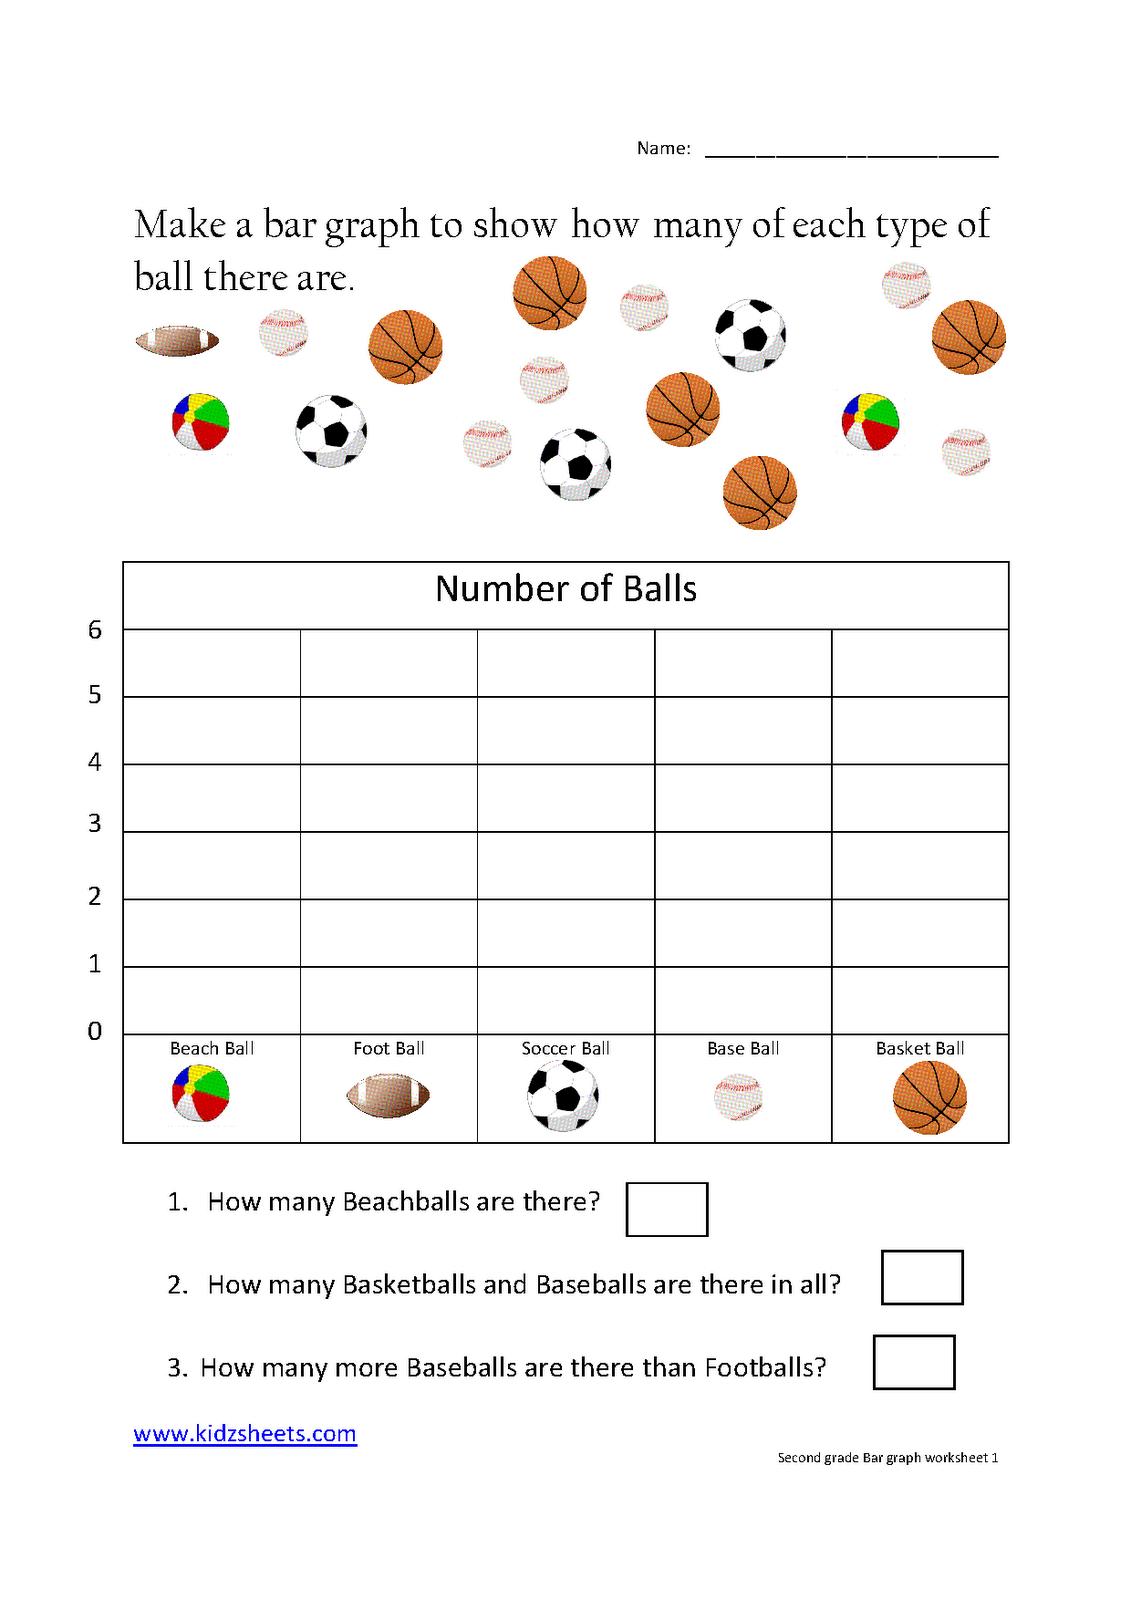 Kidz Worksheets: Second Grade Bar Graph Worksheet1 - Free Printable Bar Graph